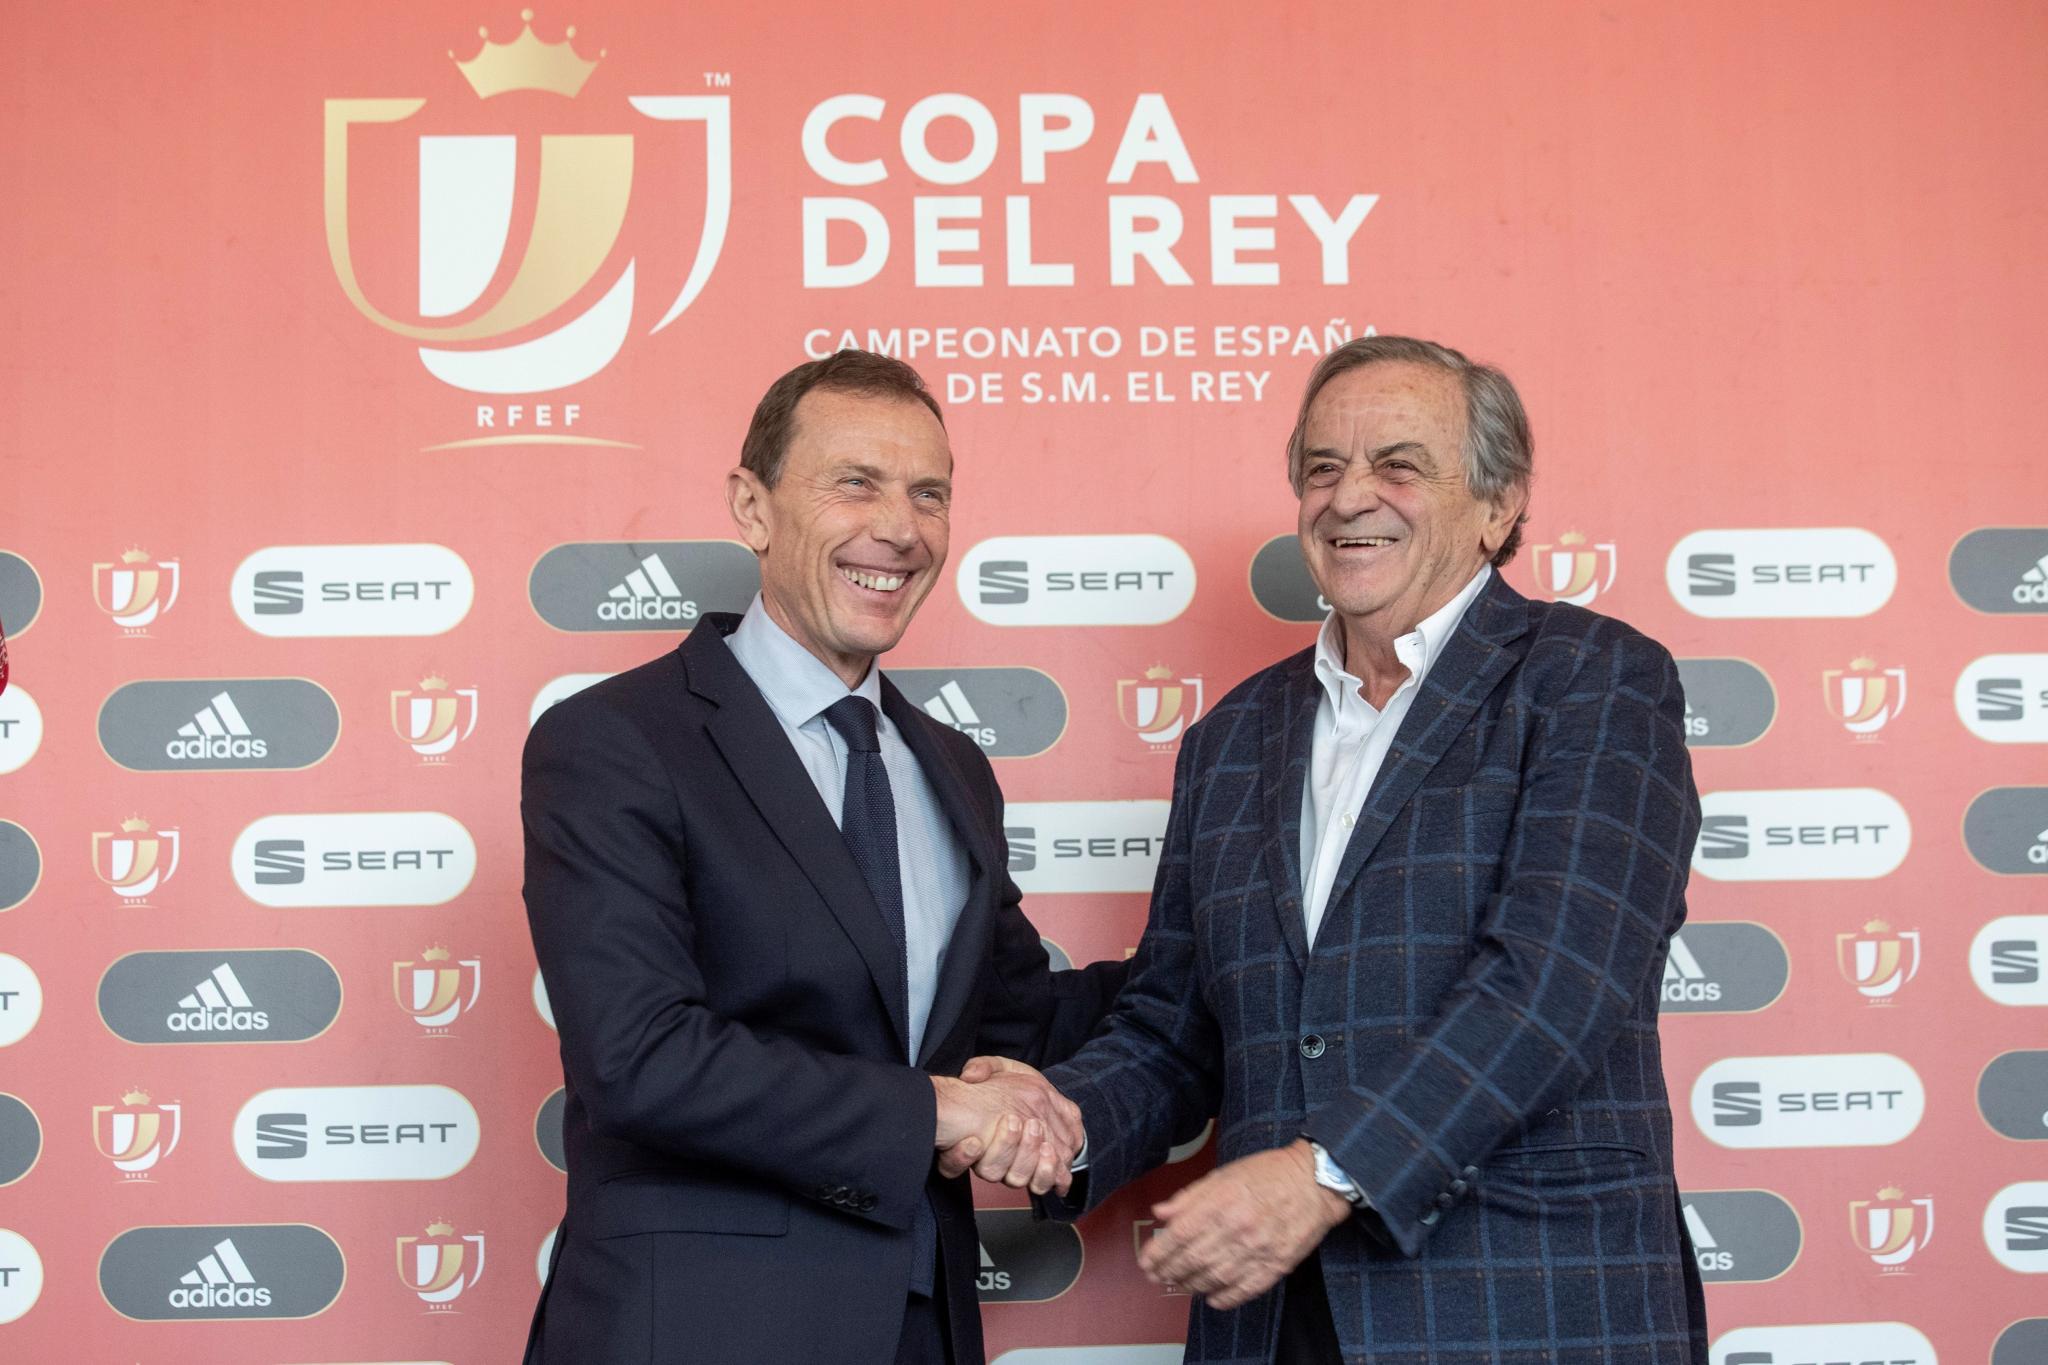 Copa Del Rey-ს წილისყრა 31 იანვარს, 16:00 საათზე შედგება